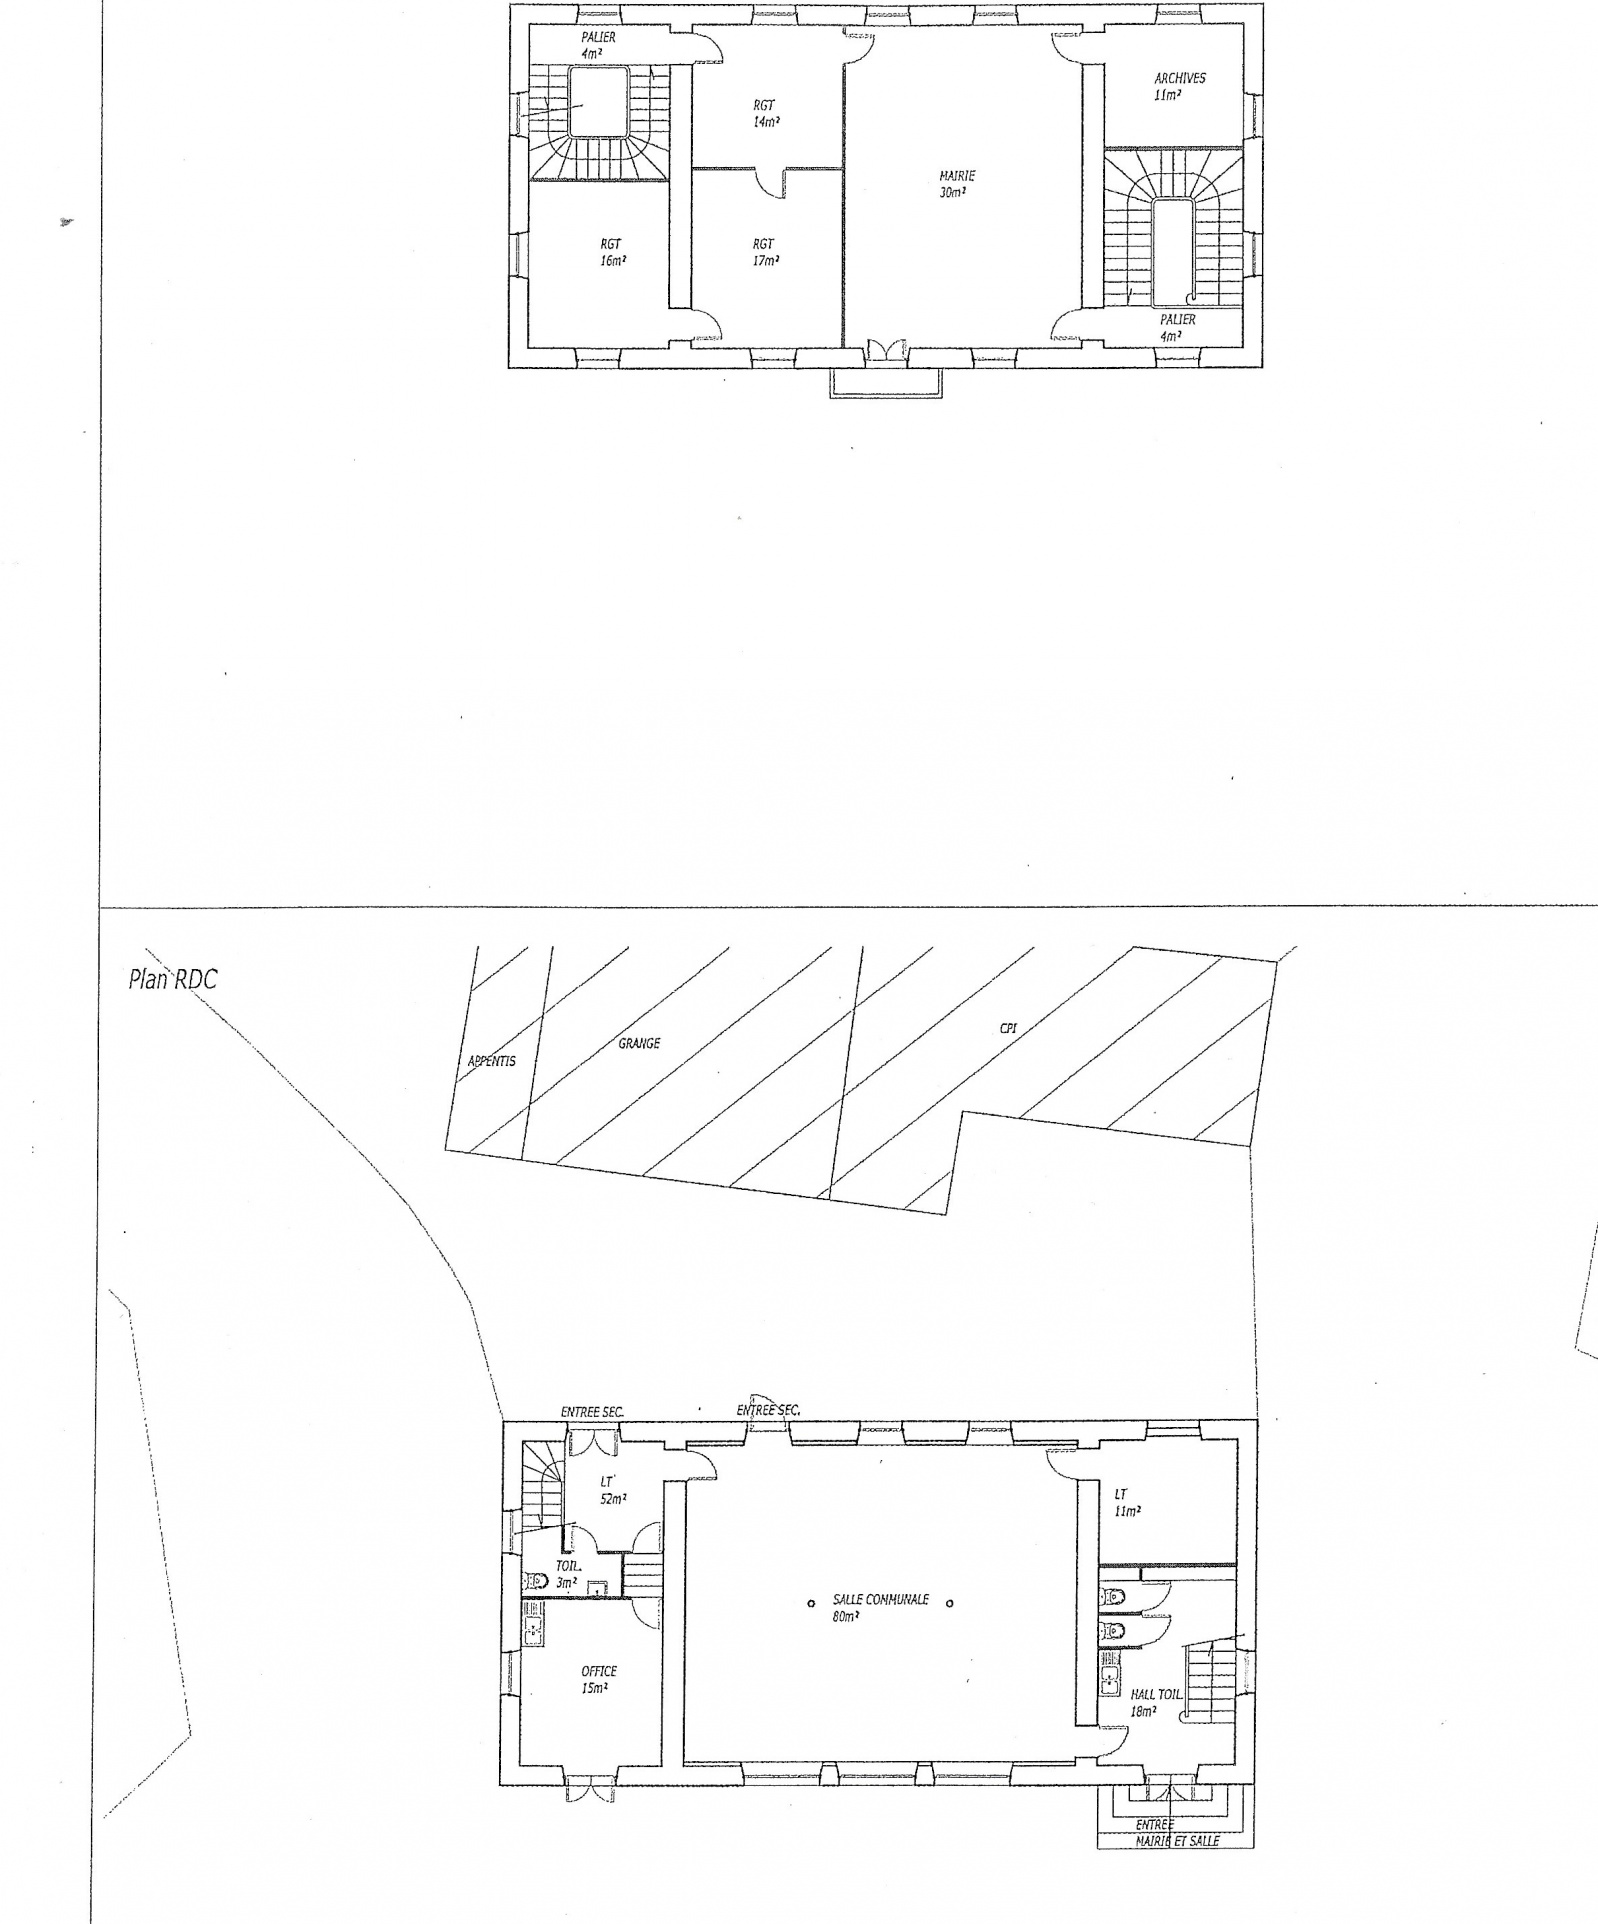 Vente maison/villa athee